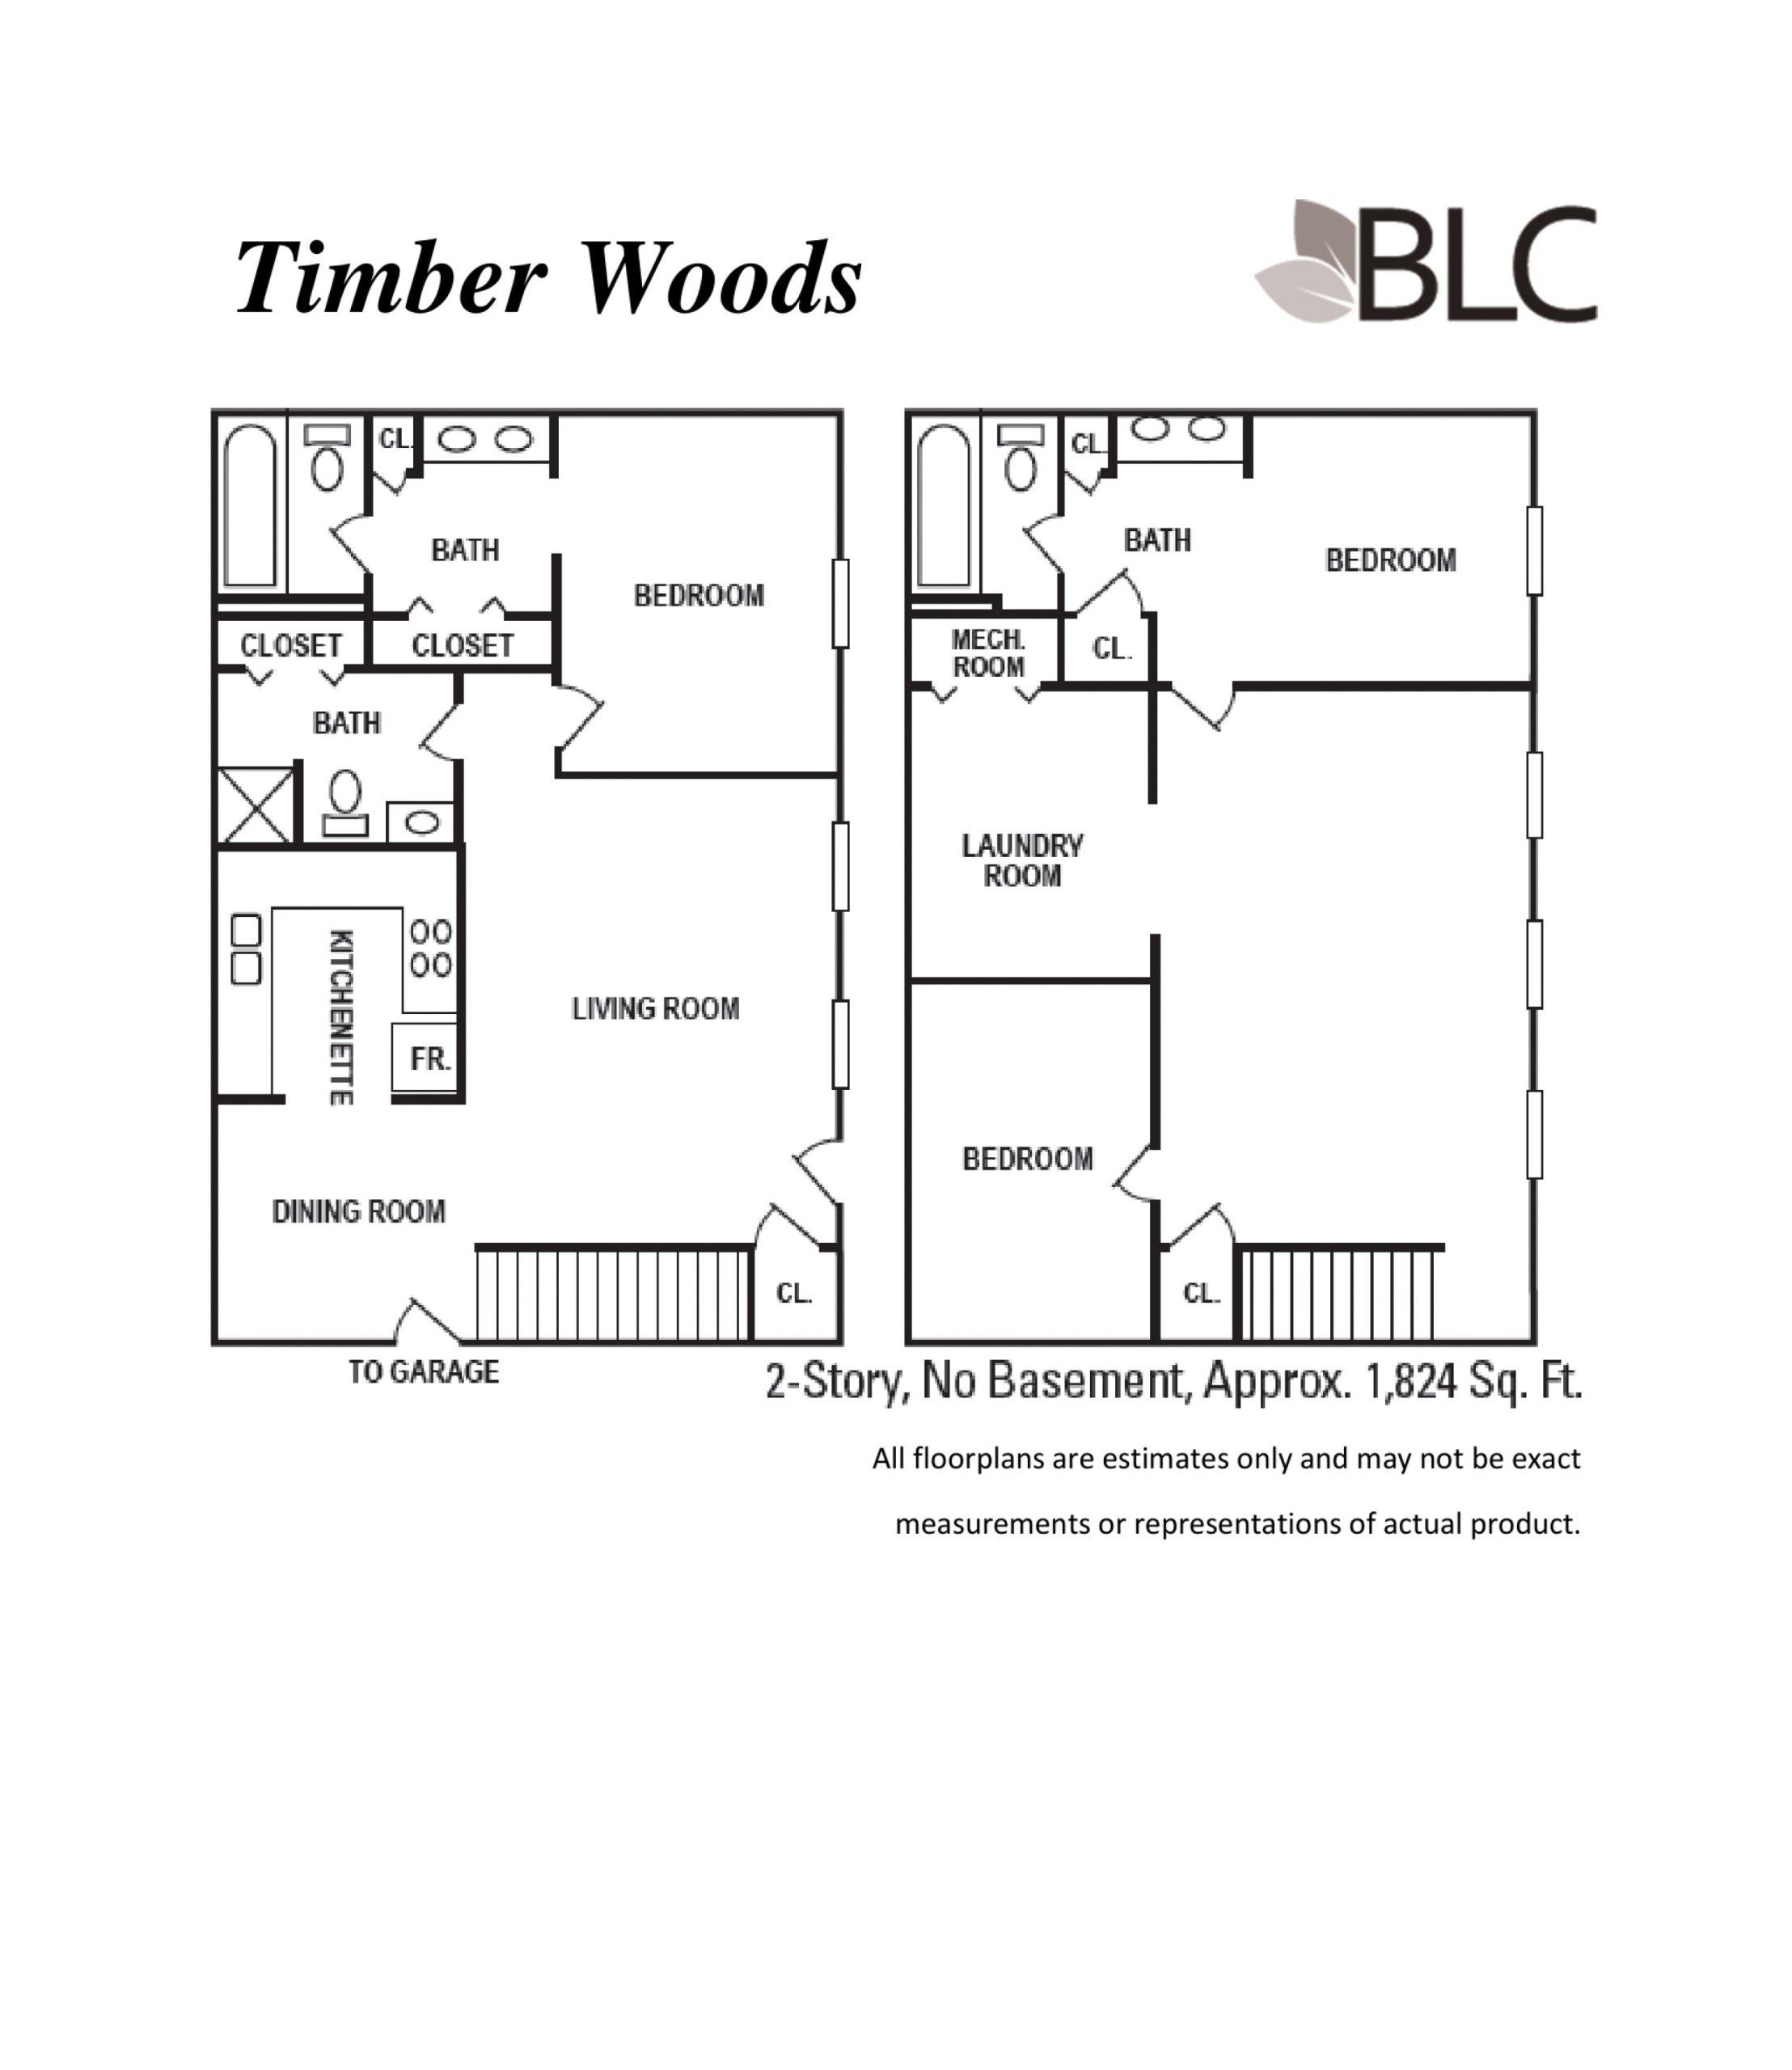 Timber Woods 2 Story No Basement